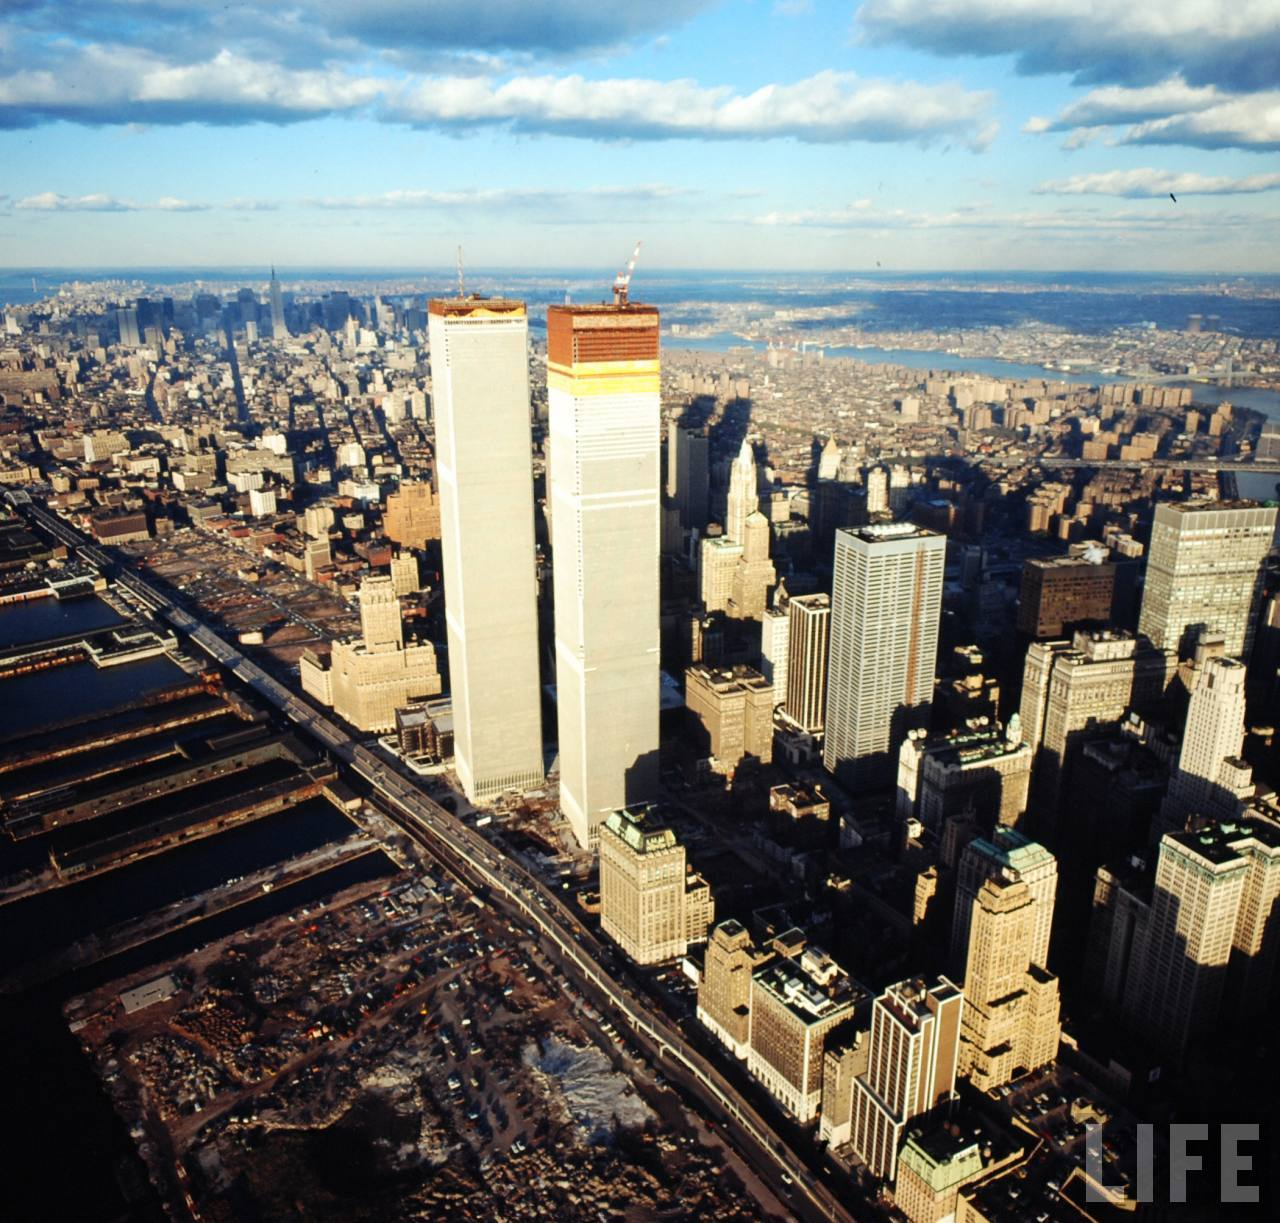 stunning photographs captured the world trade center under